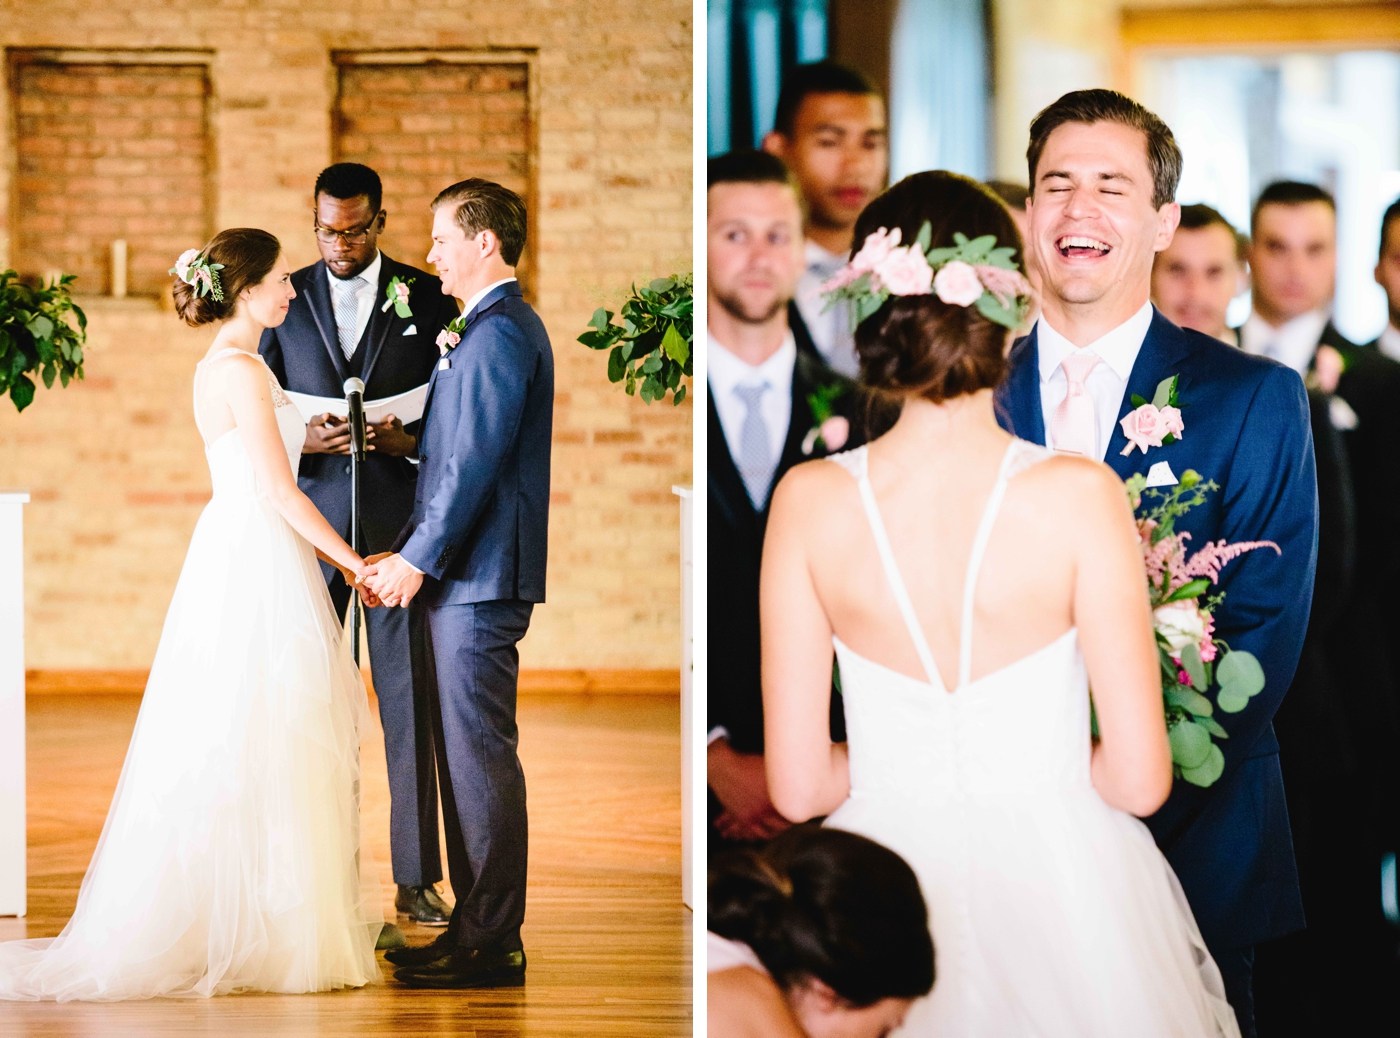 chicago-fine-art-wedding-photography-tyma25